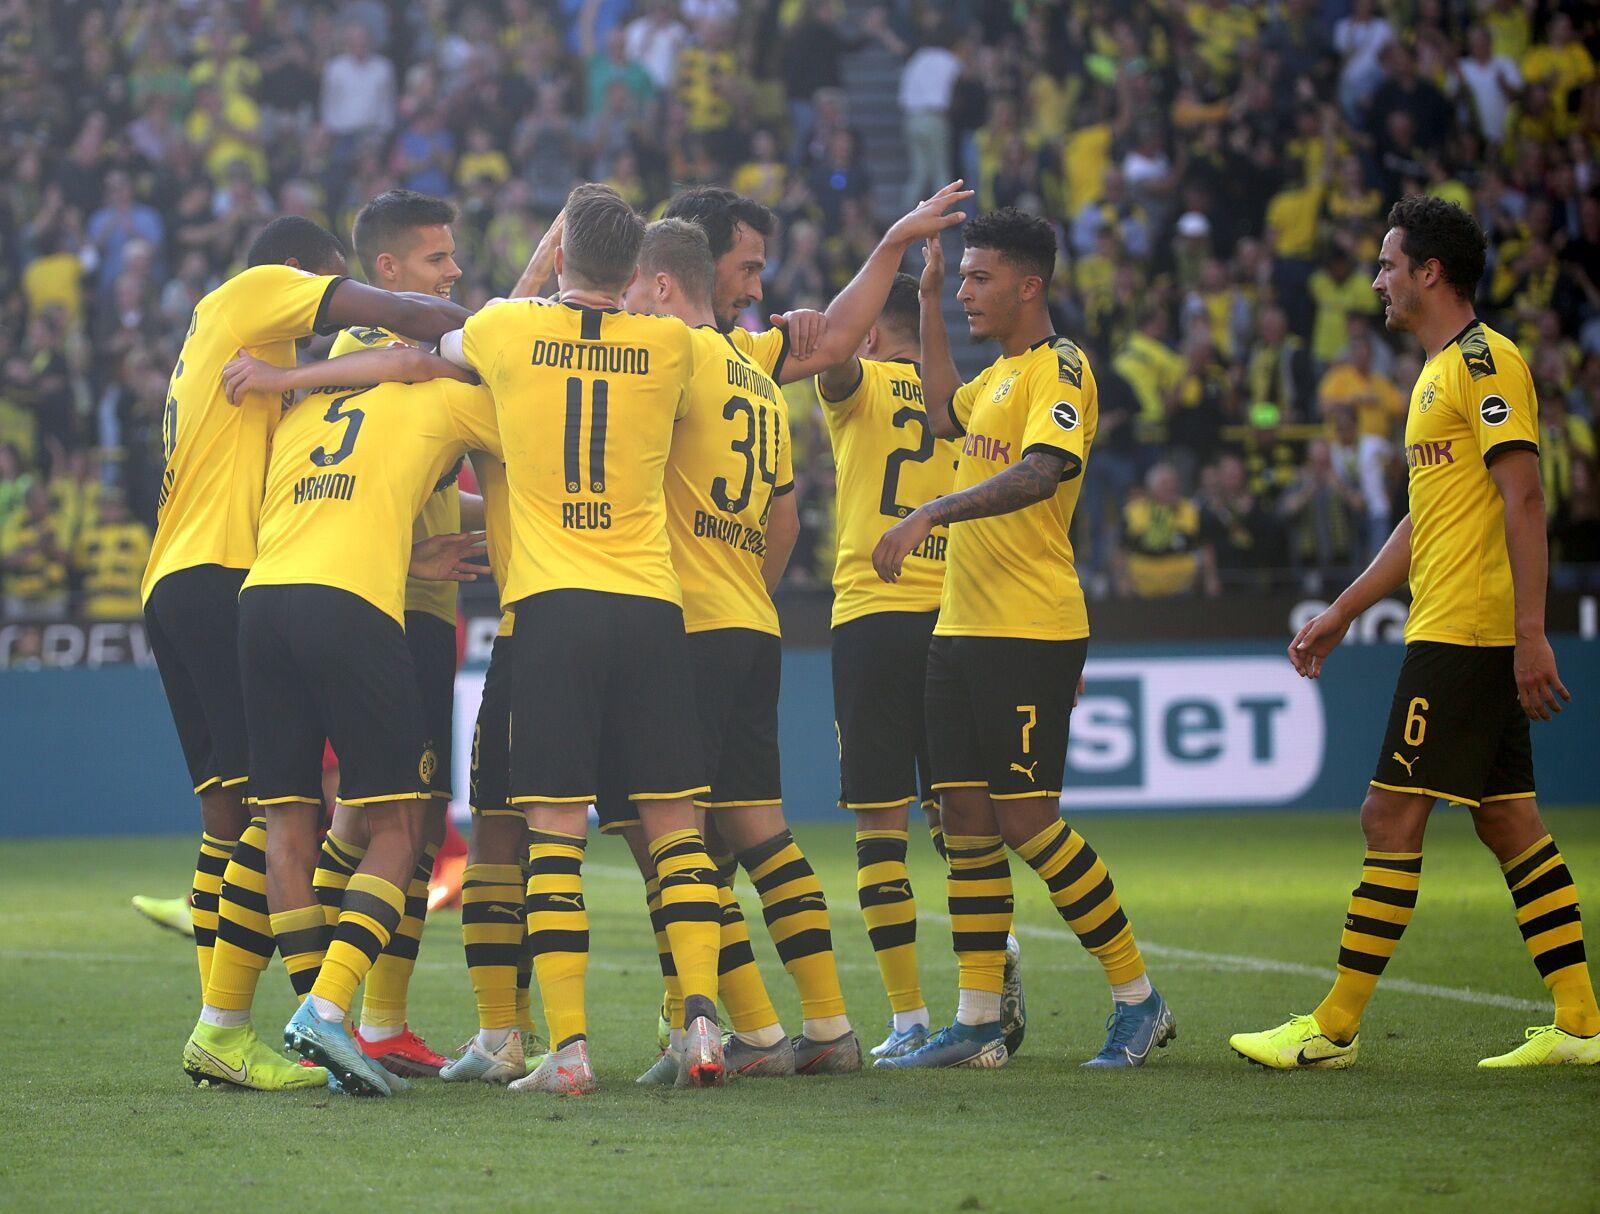 Bundesliga Roundup: Borussia Dortmund thump Leverkusen, Mönchengladbach win Rhineland derby